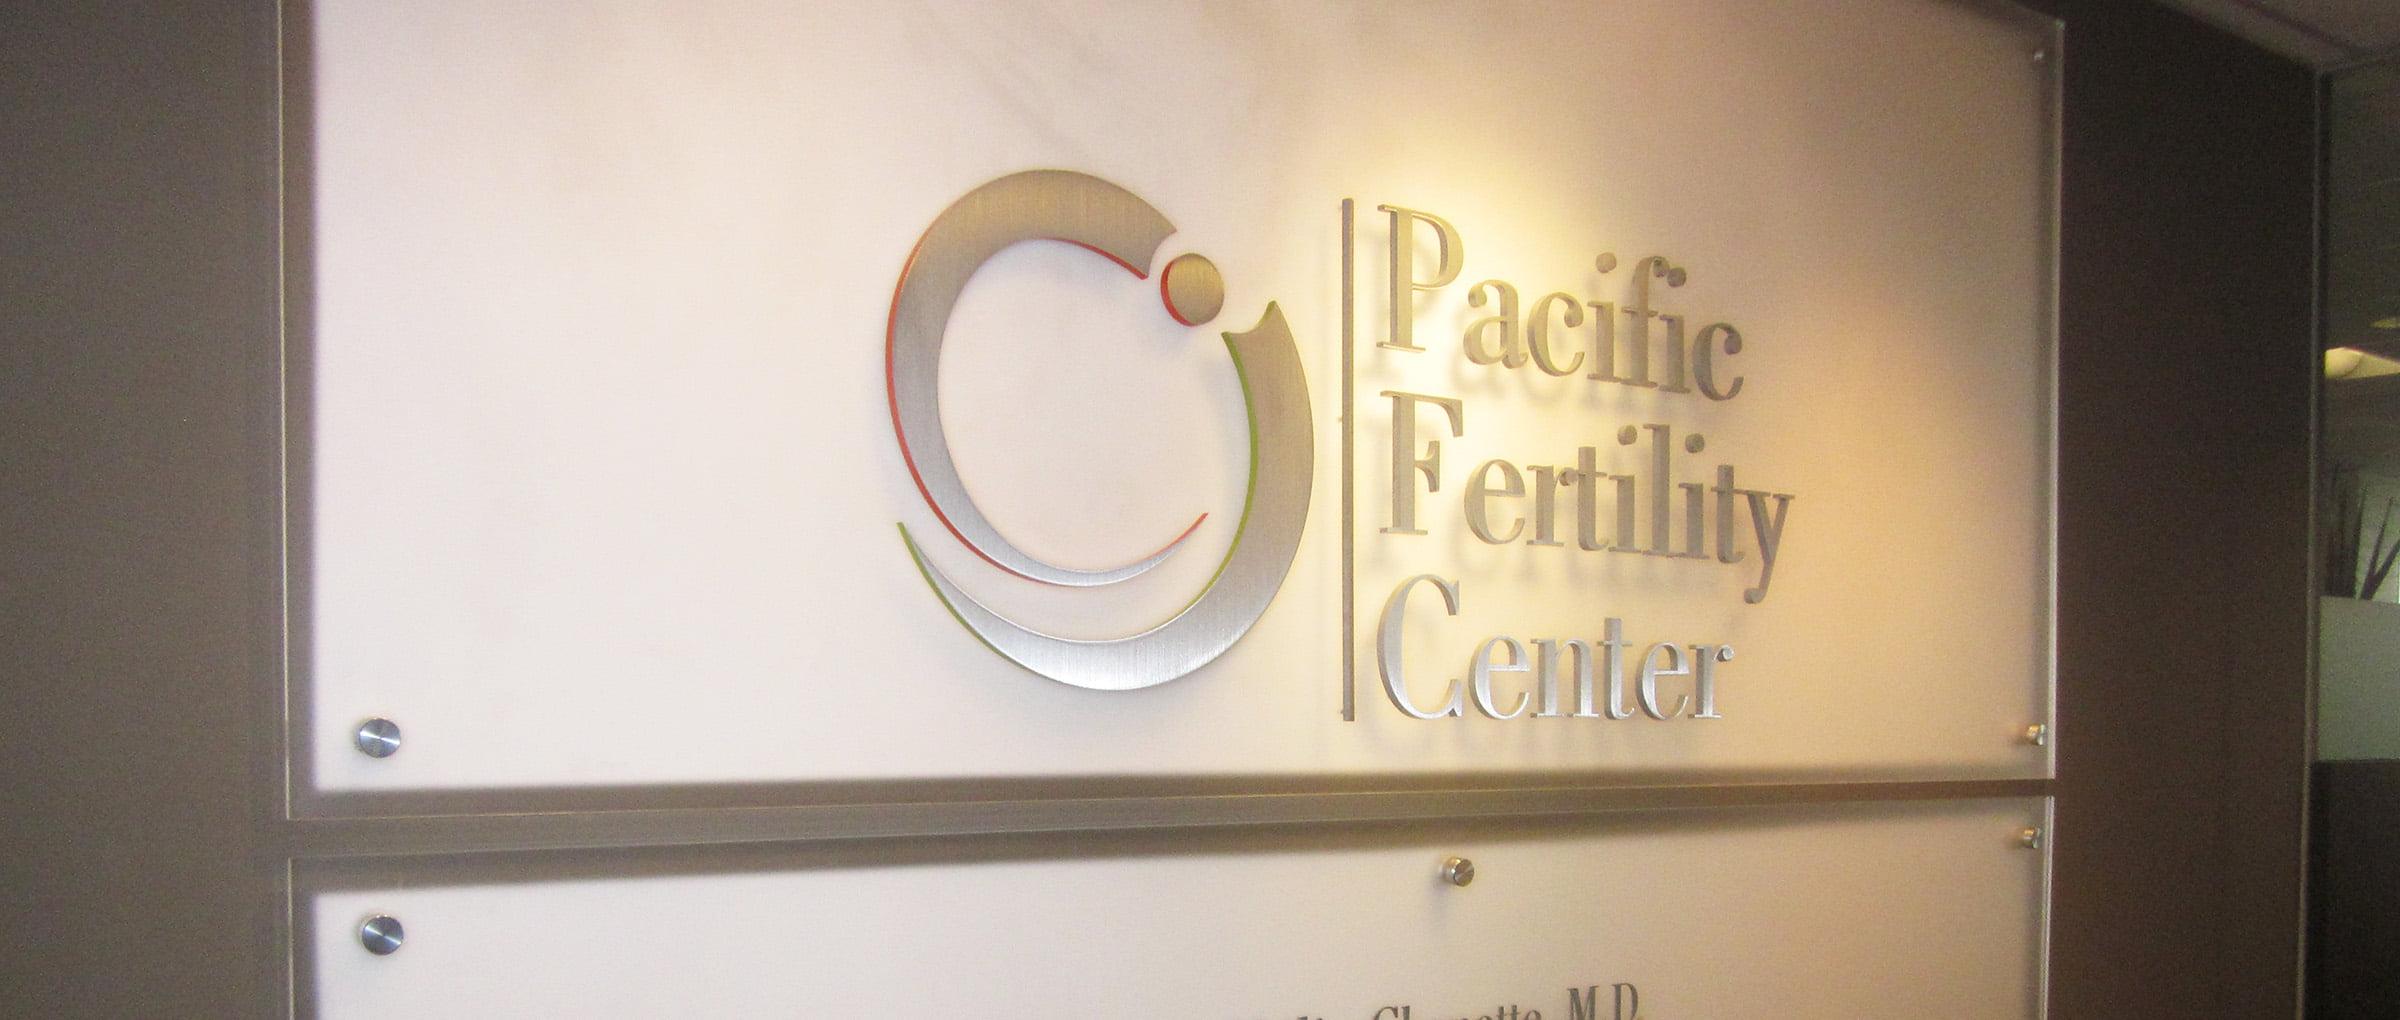 Pacific Fertility Center